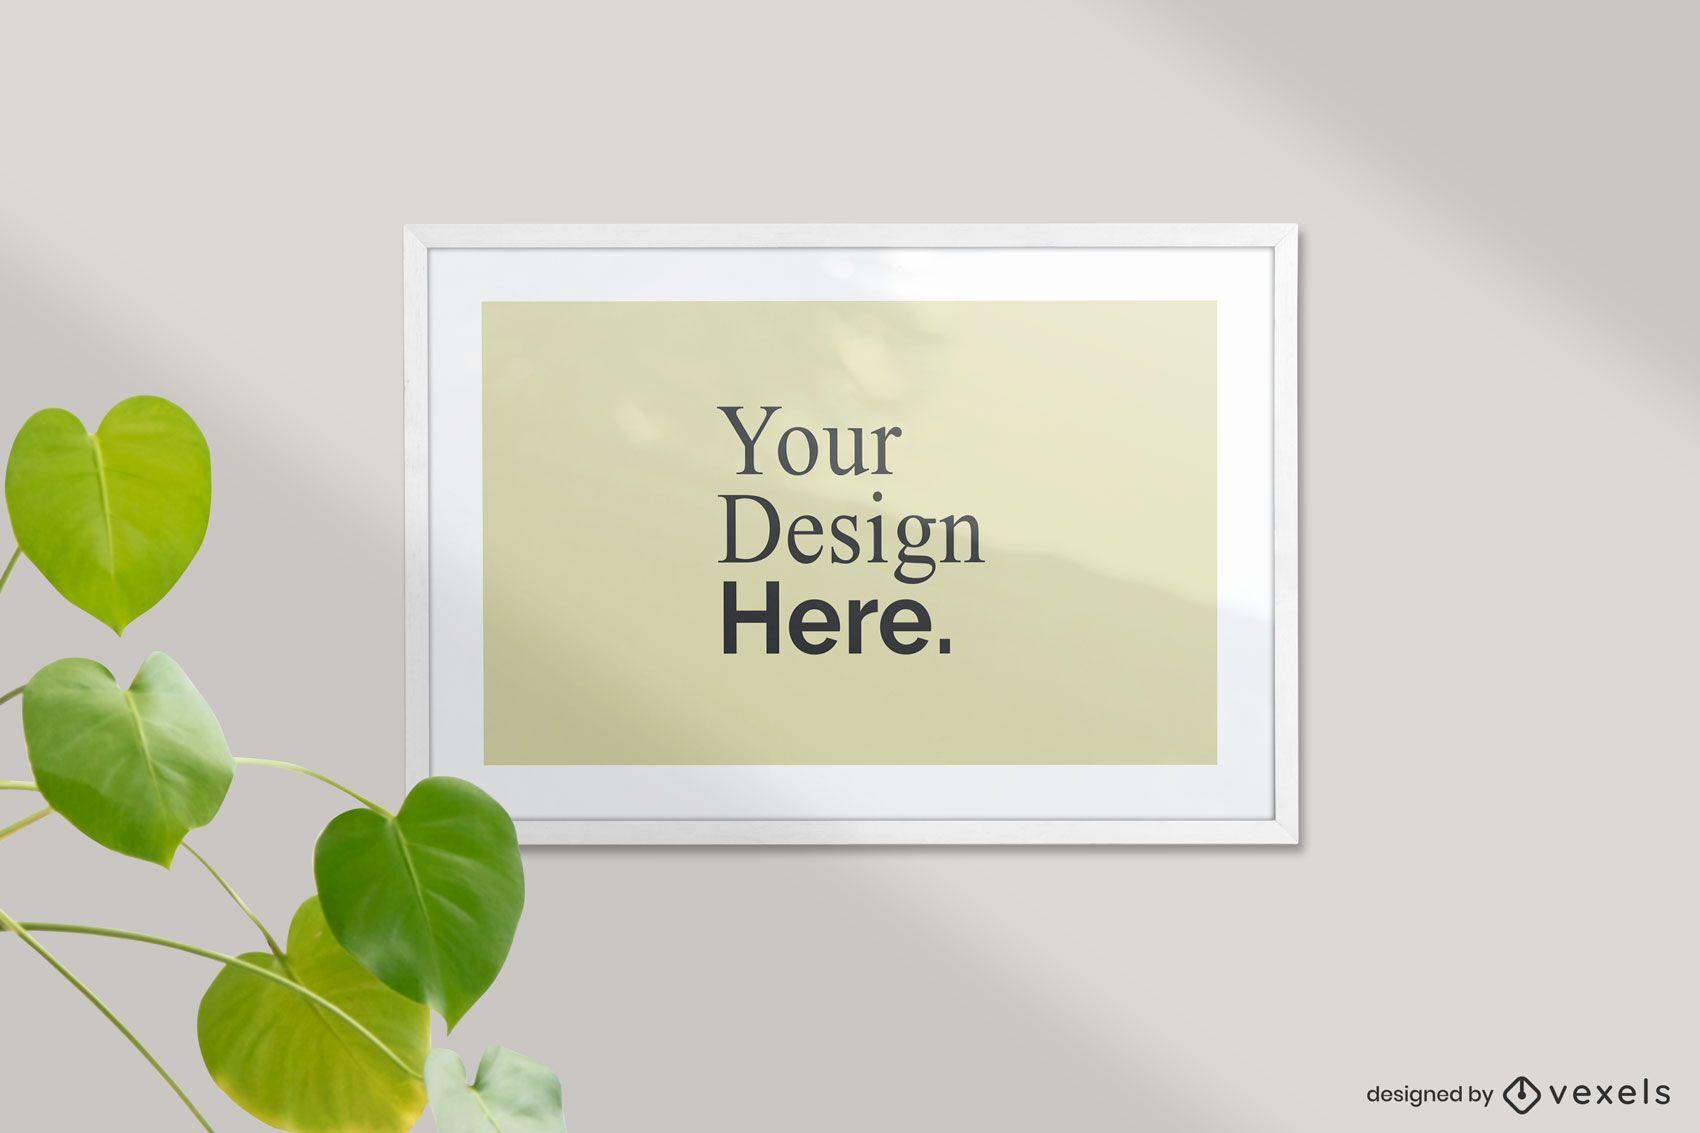 Framed horizontal poster mockup